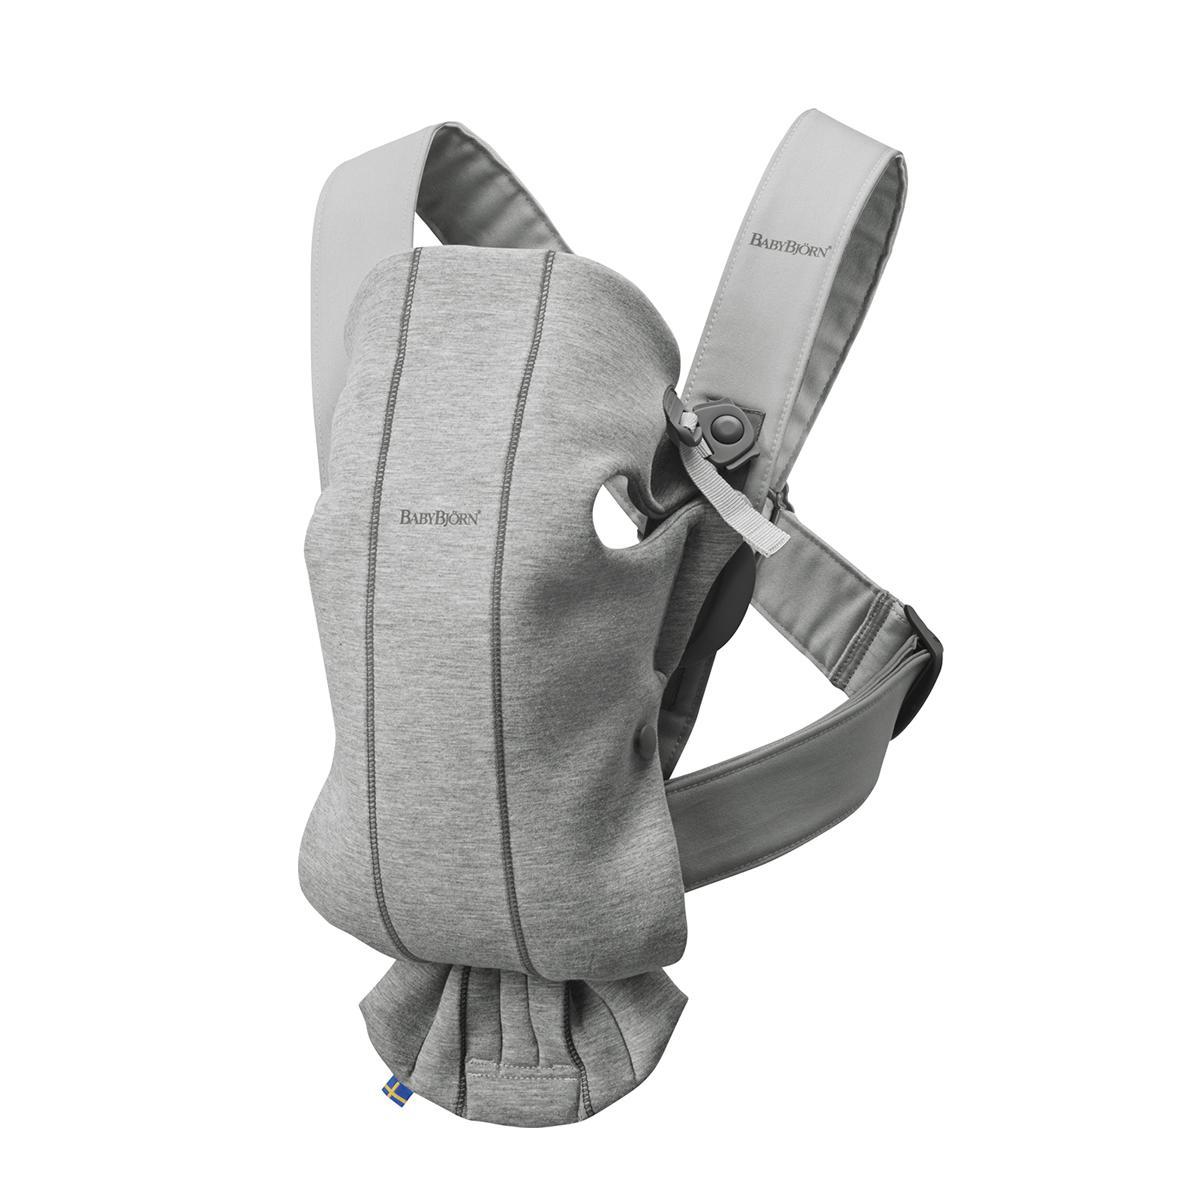 Mochila BabyBjörn Porta Bebé Mini, Gris Claro, 3D, Jersey